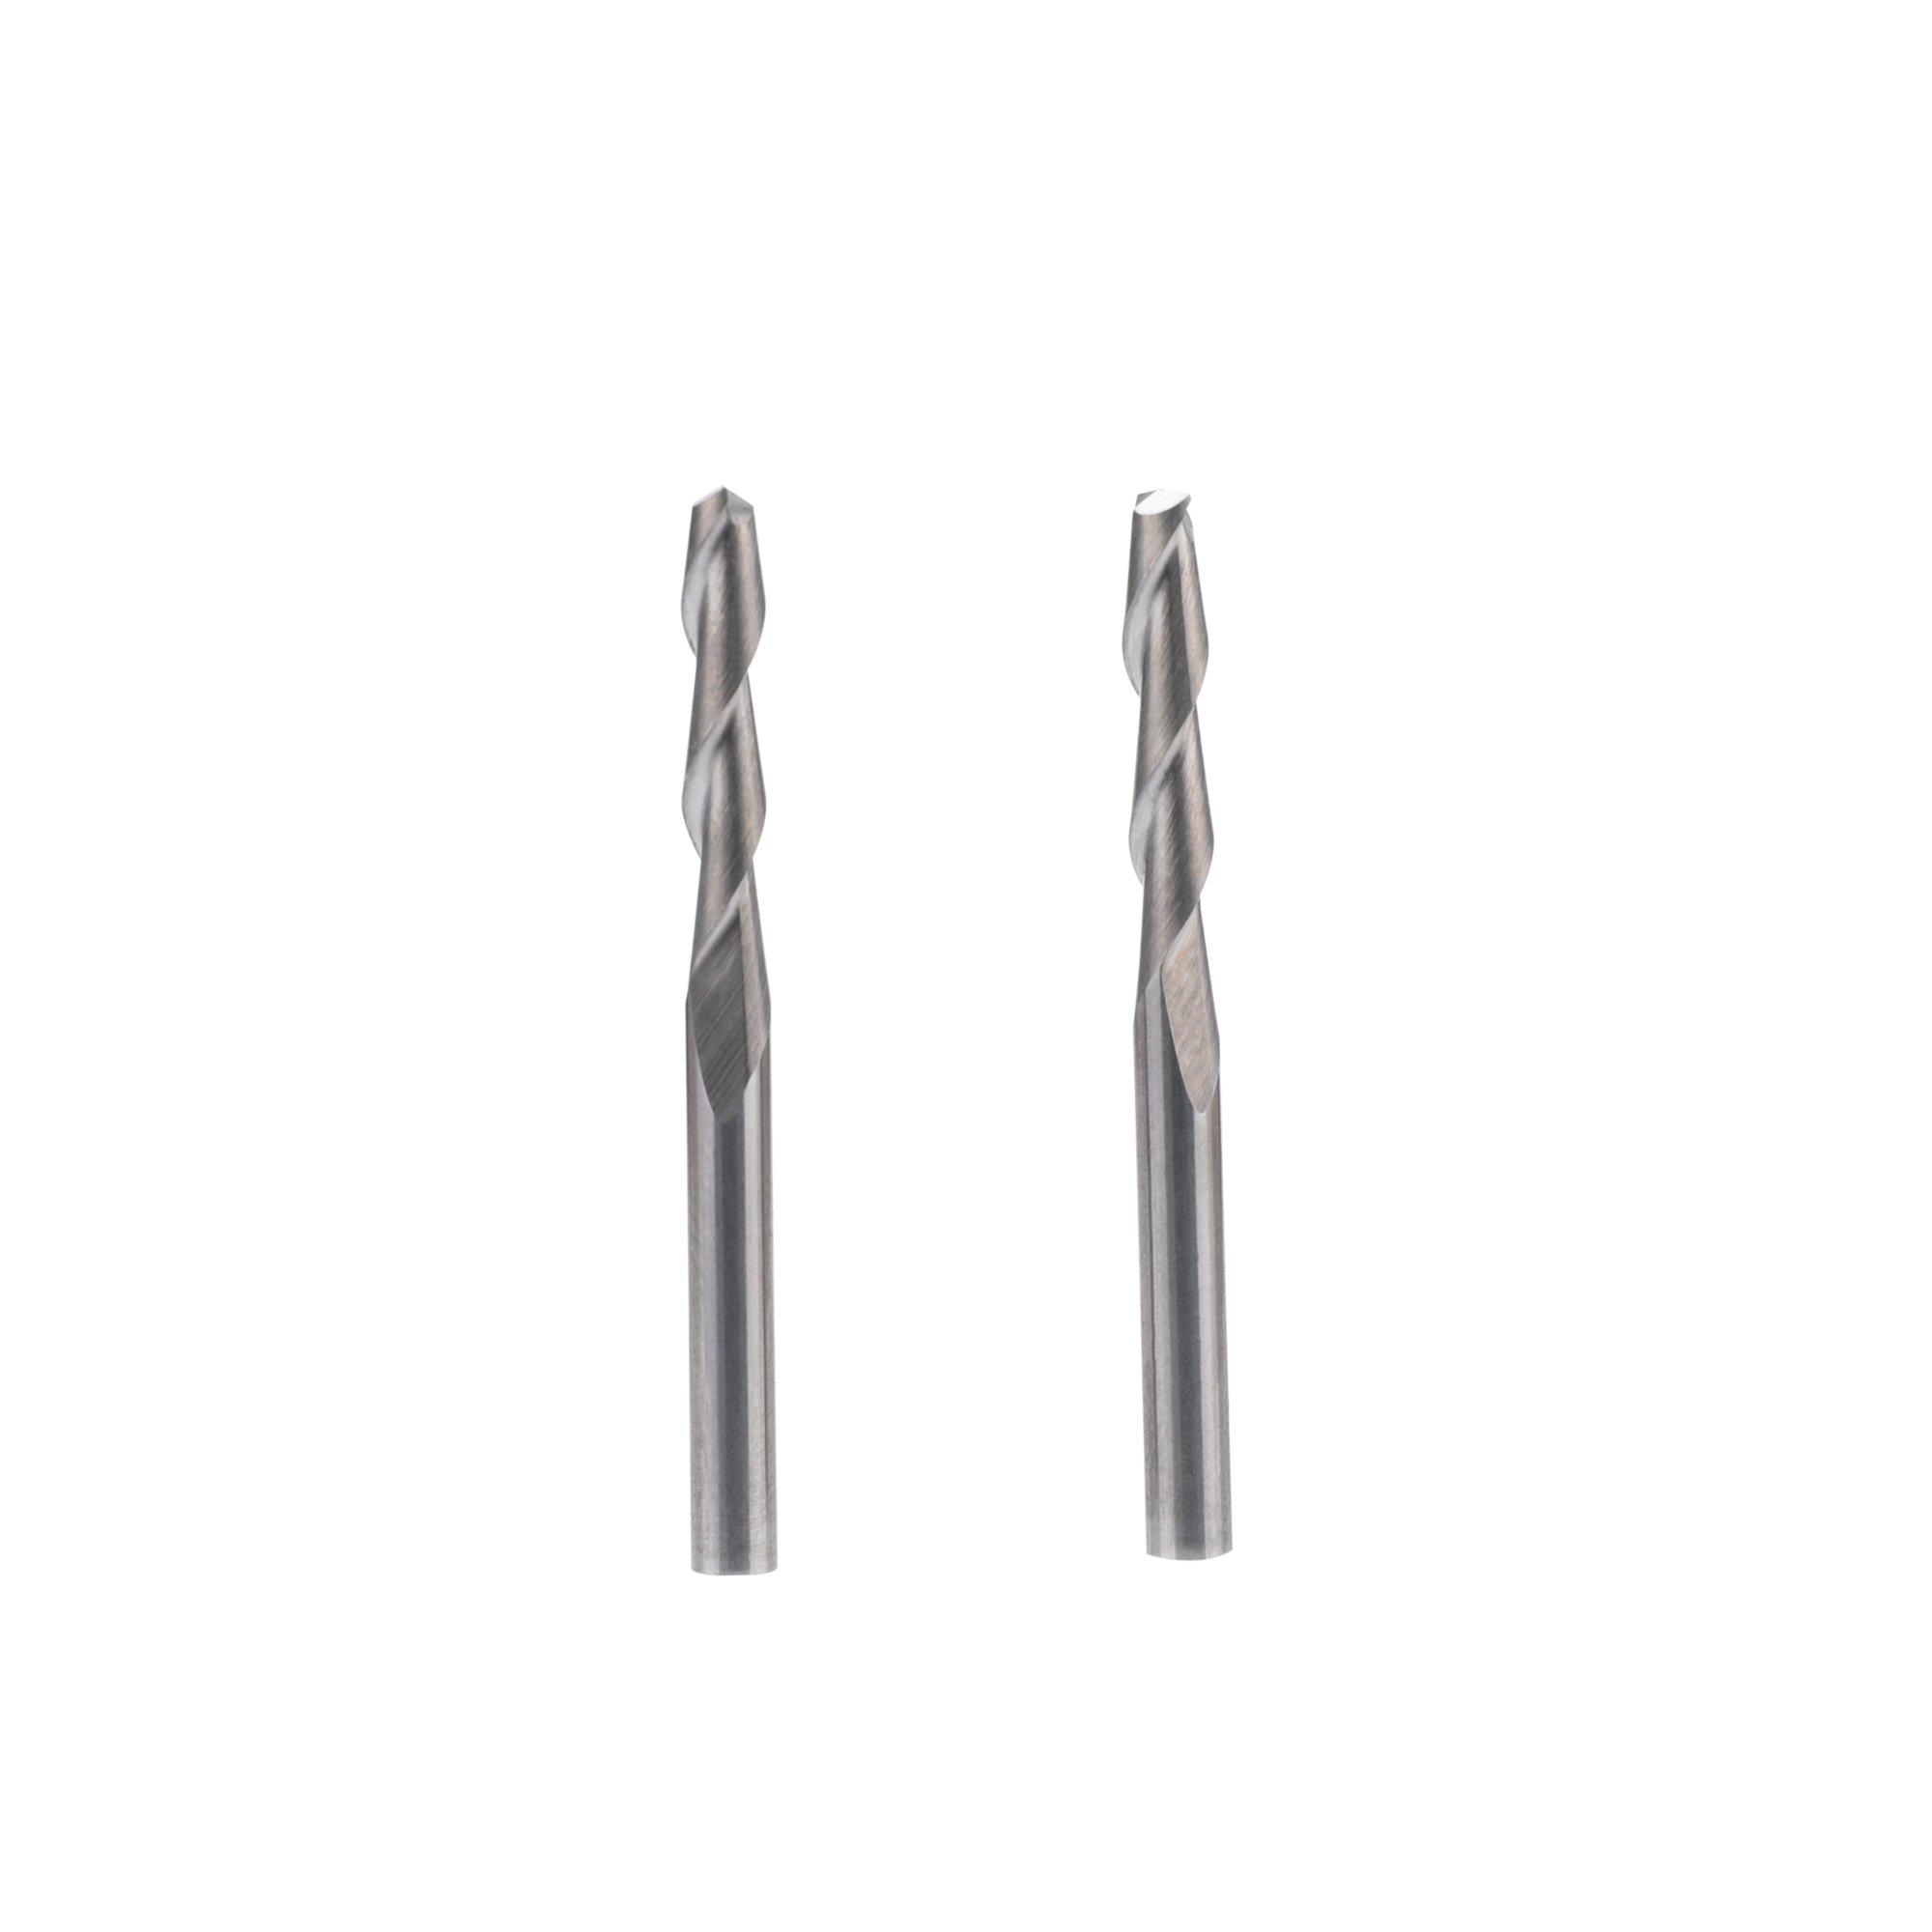 "10pcs 1//8"" Carbide Flat Nose End Mill CNC Router Bits Single Flute Spiral 17mm"